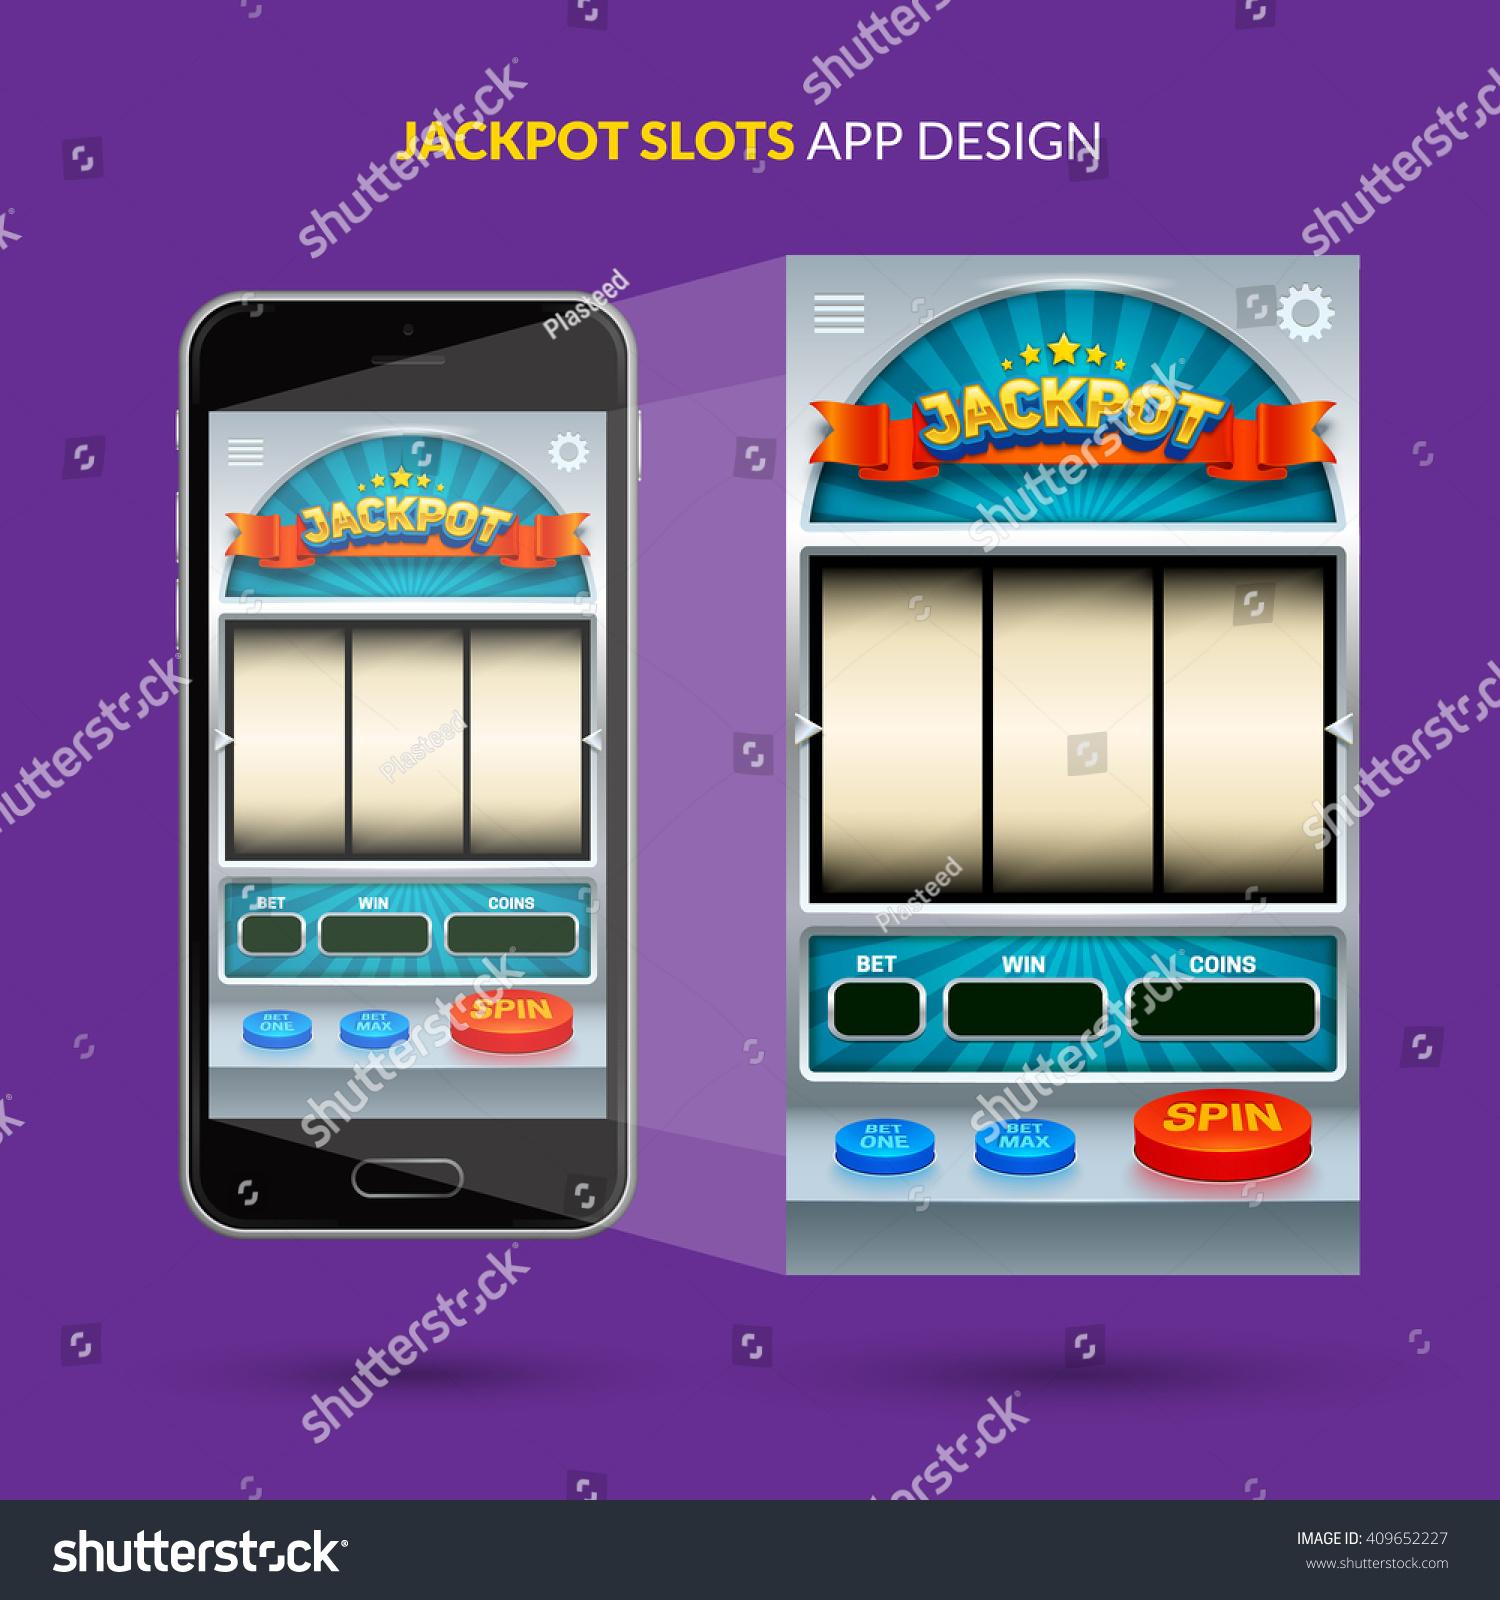 Application slots